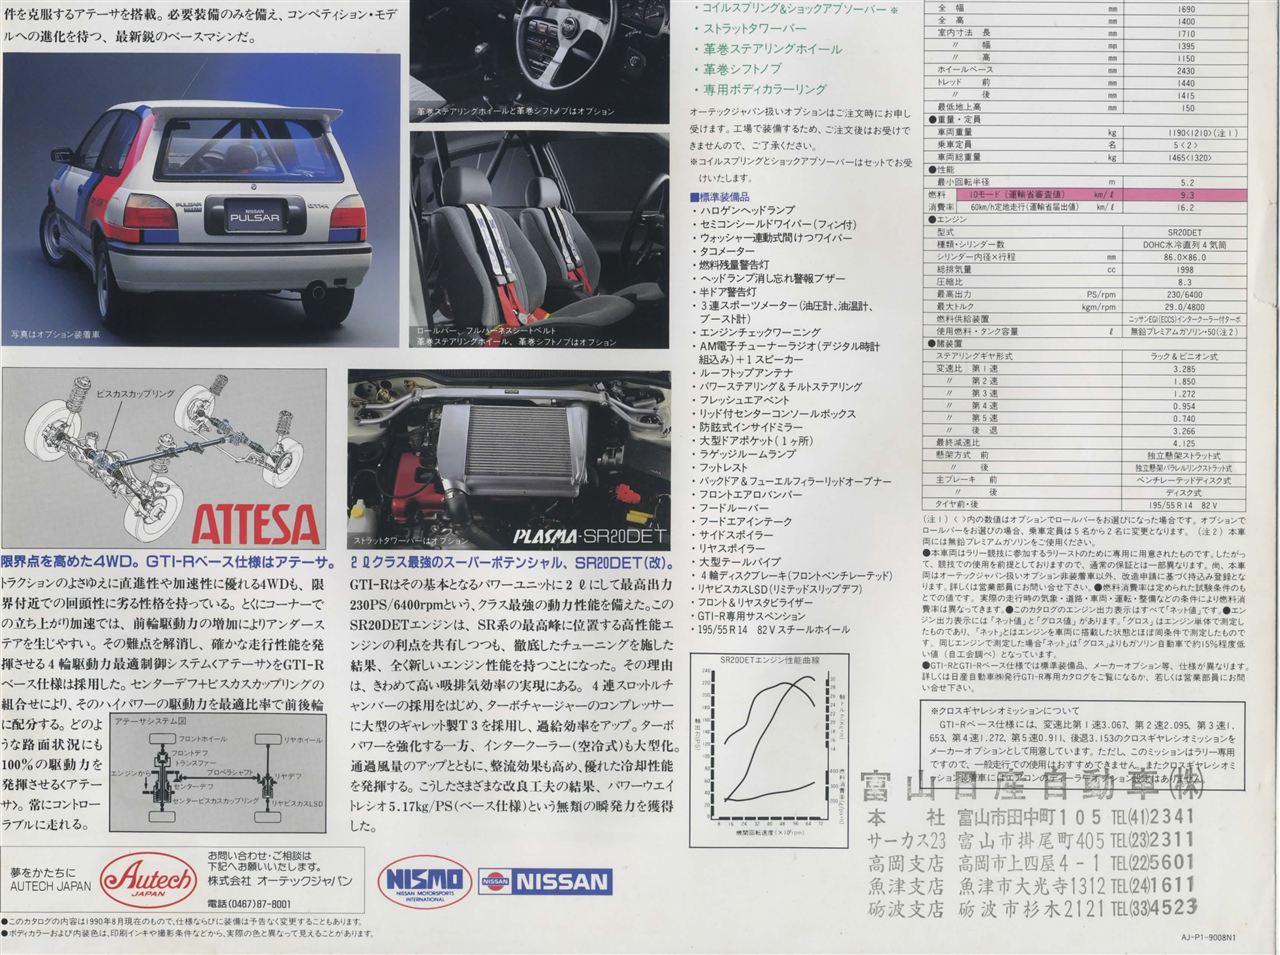 Nissan Pulsar Sunny GTi-R N14 日産 日本車 ホットハッチ スポーツカー NISMO